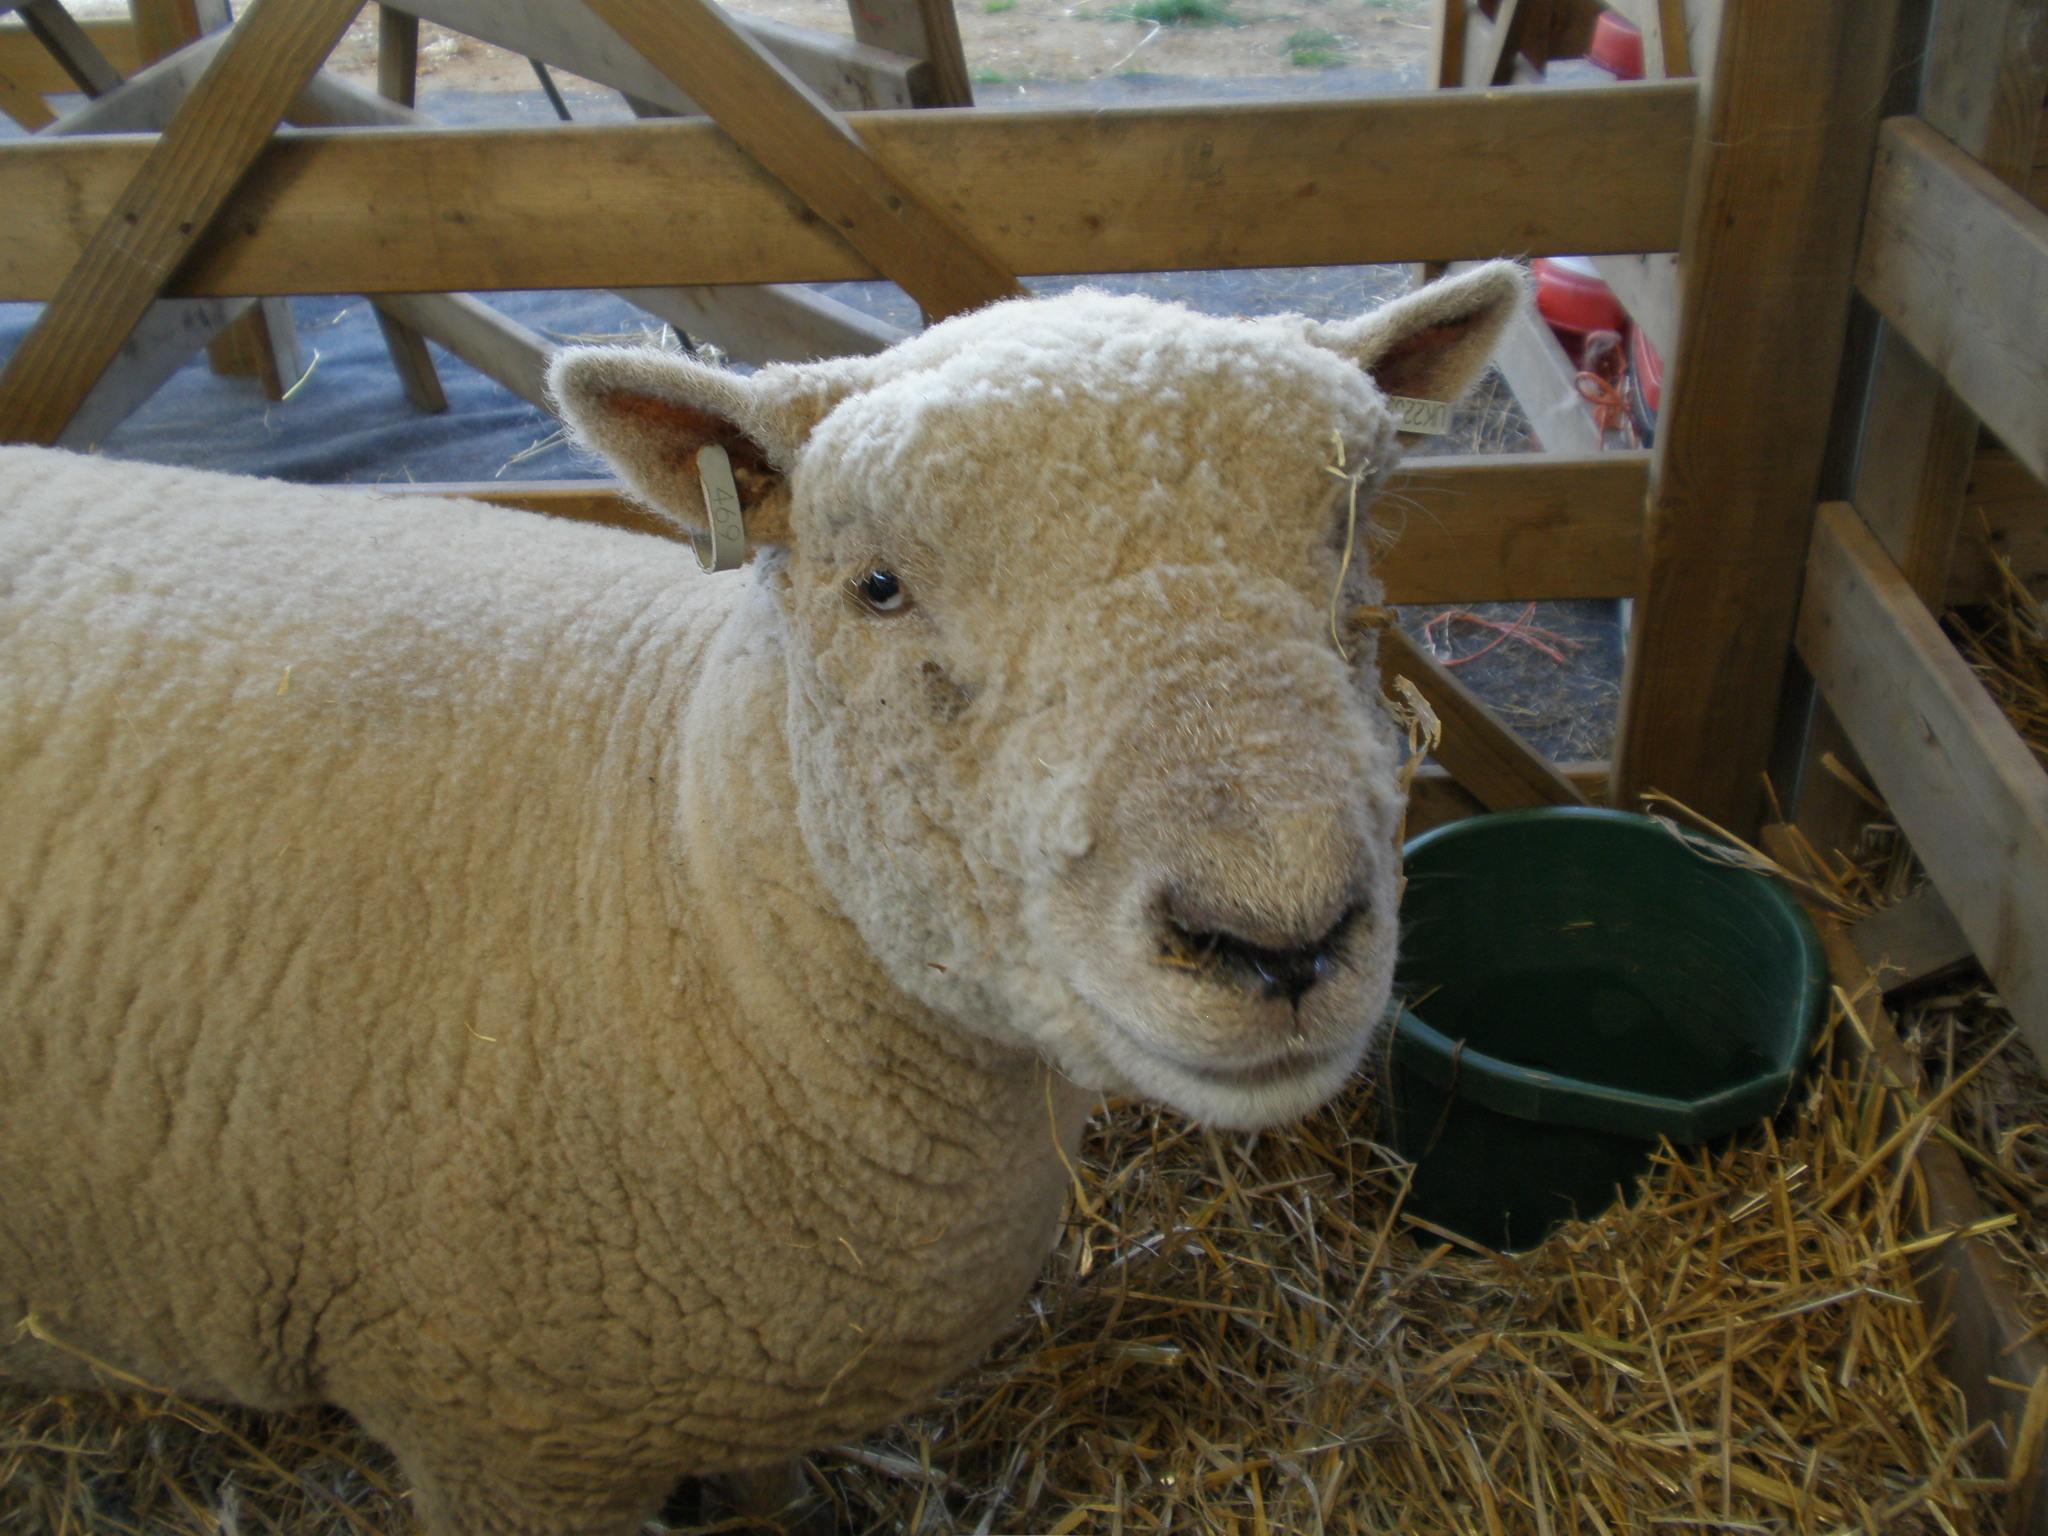 File:Southdown sheep, Suffolk Show.jpg - Wikipedia